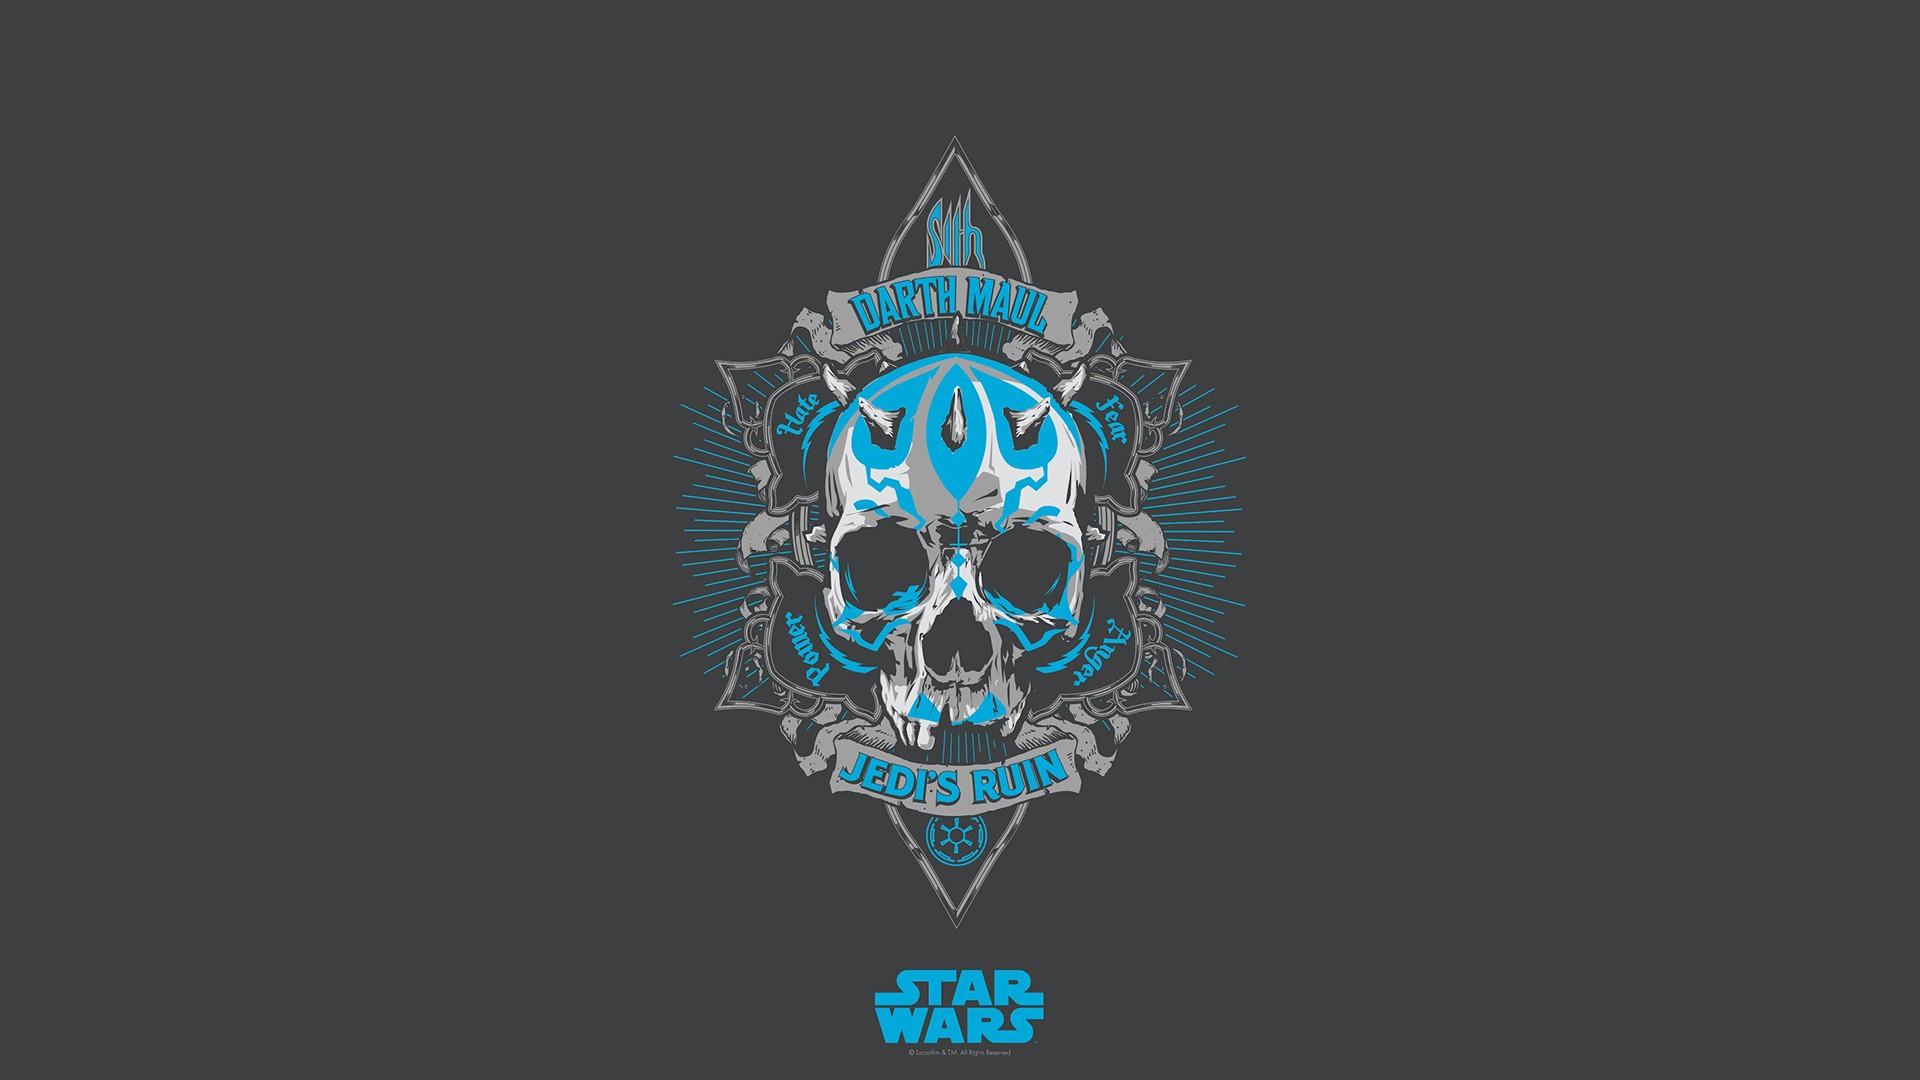 star wars skull darth maul wallpaper | 1920x1080 | 136959 | wallpaperup